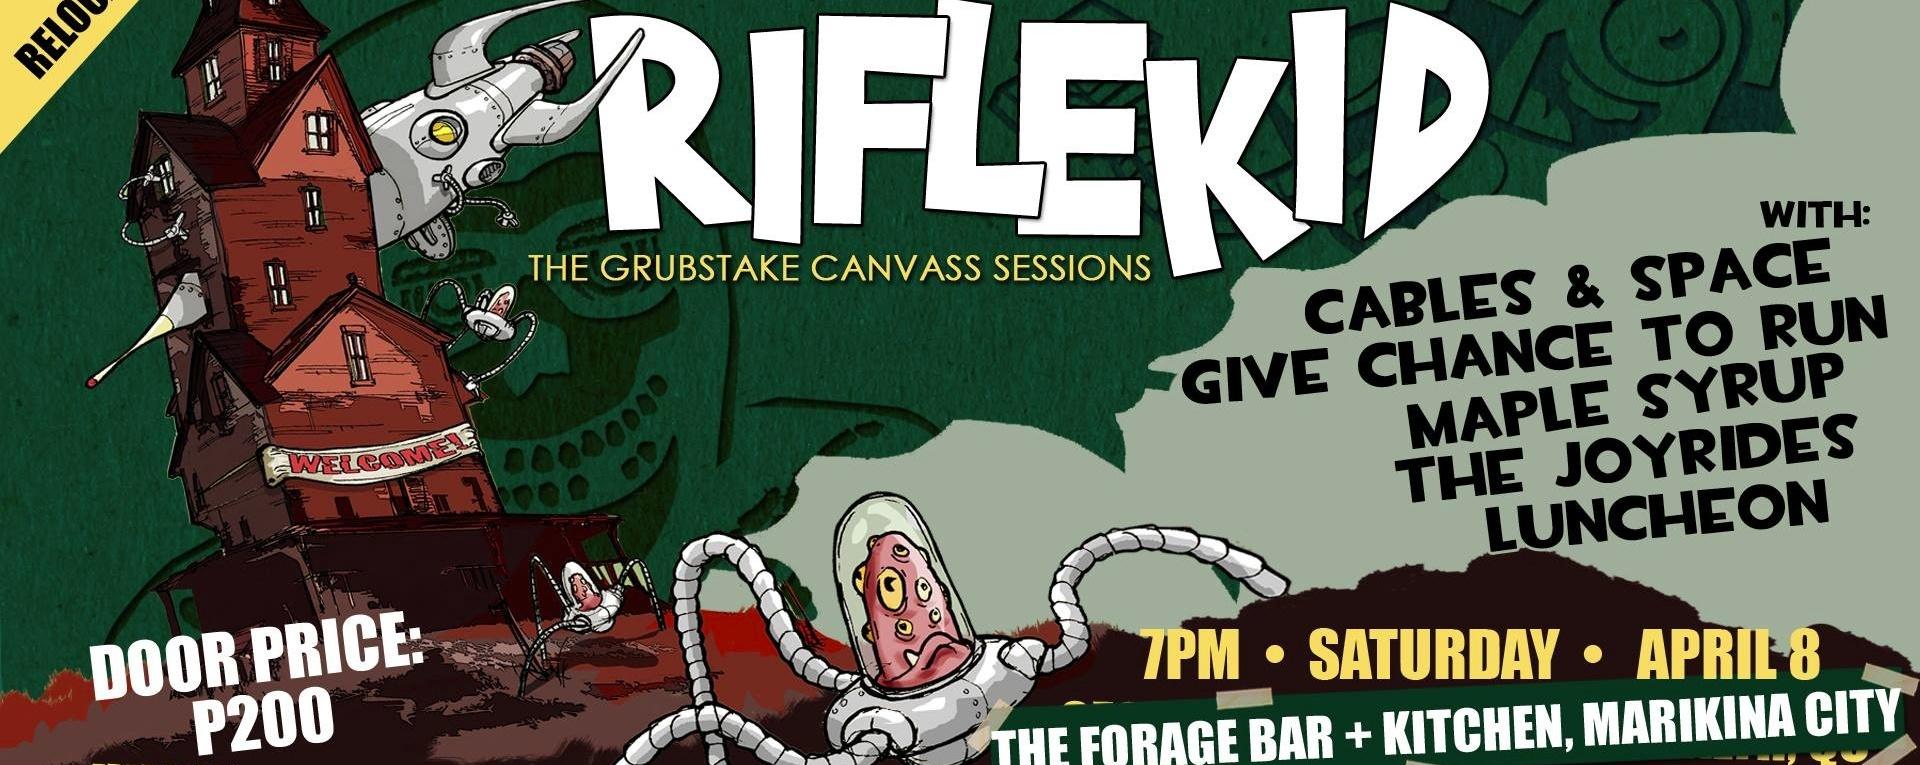 The Grubstake Canvass Sessions: Riflekid